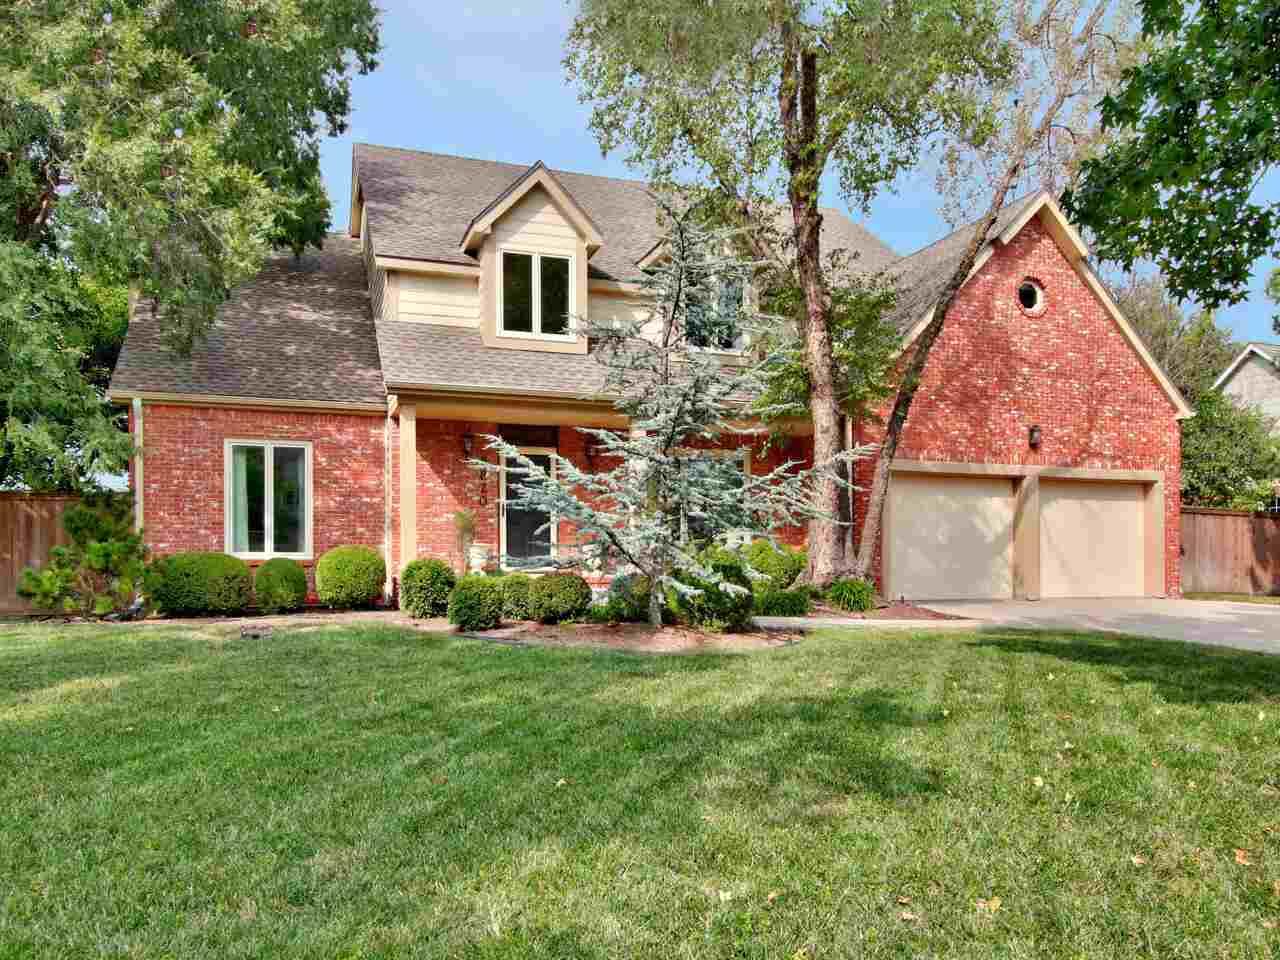 This exquisite brick home is nestled in one of Wichita's most prestigious neighborhoods, Wilderness